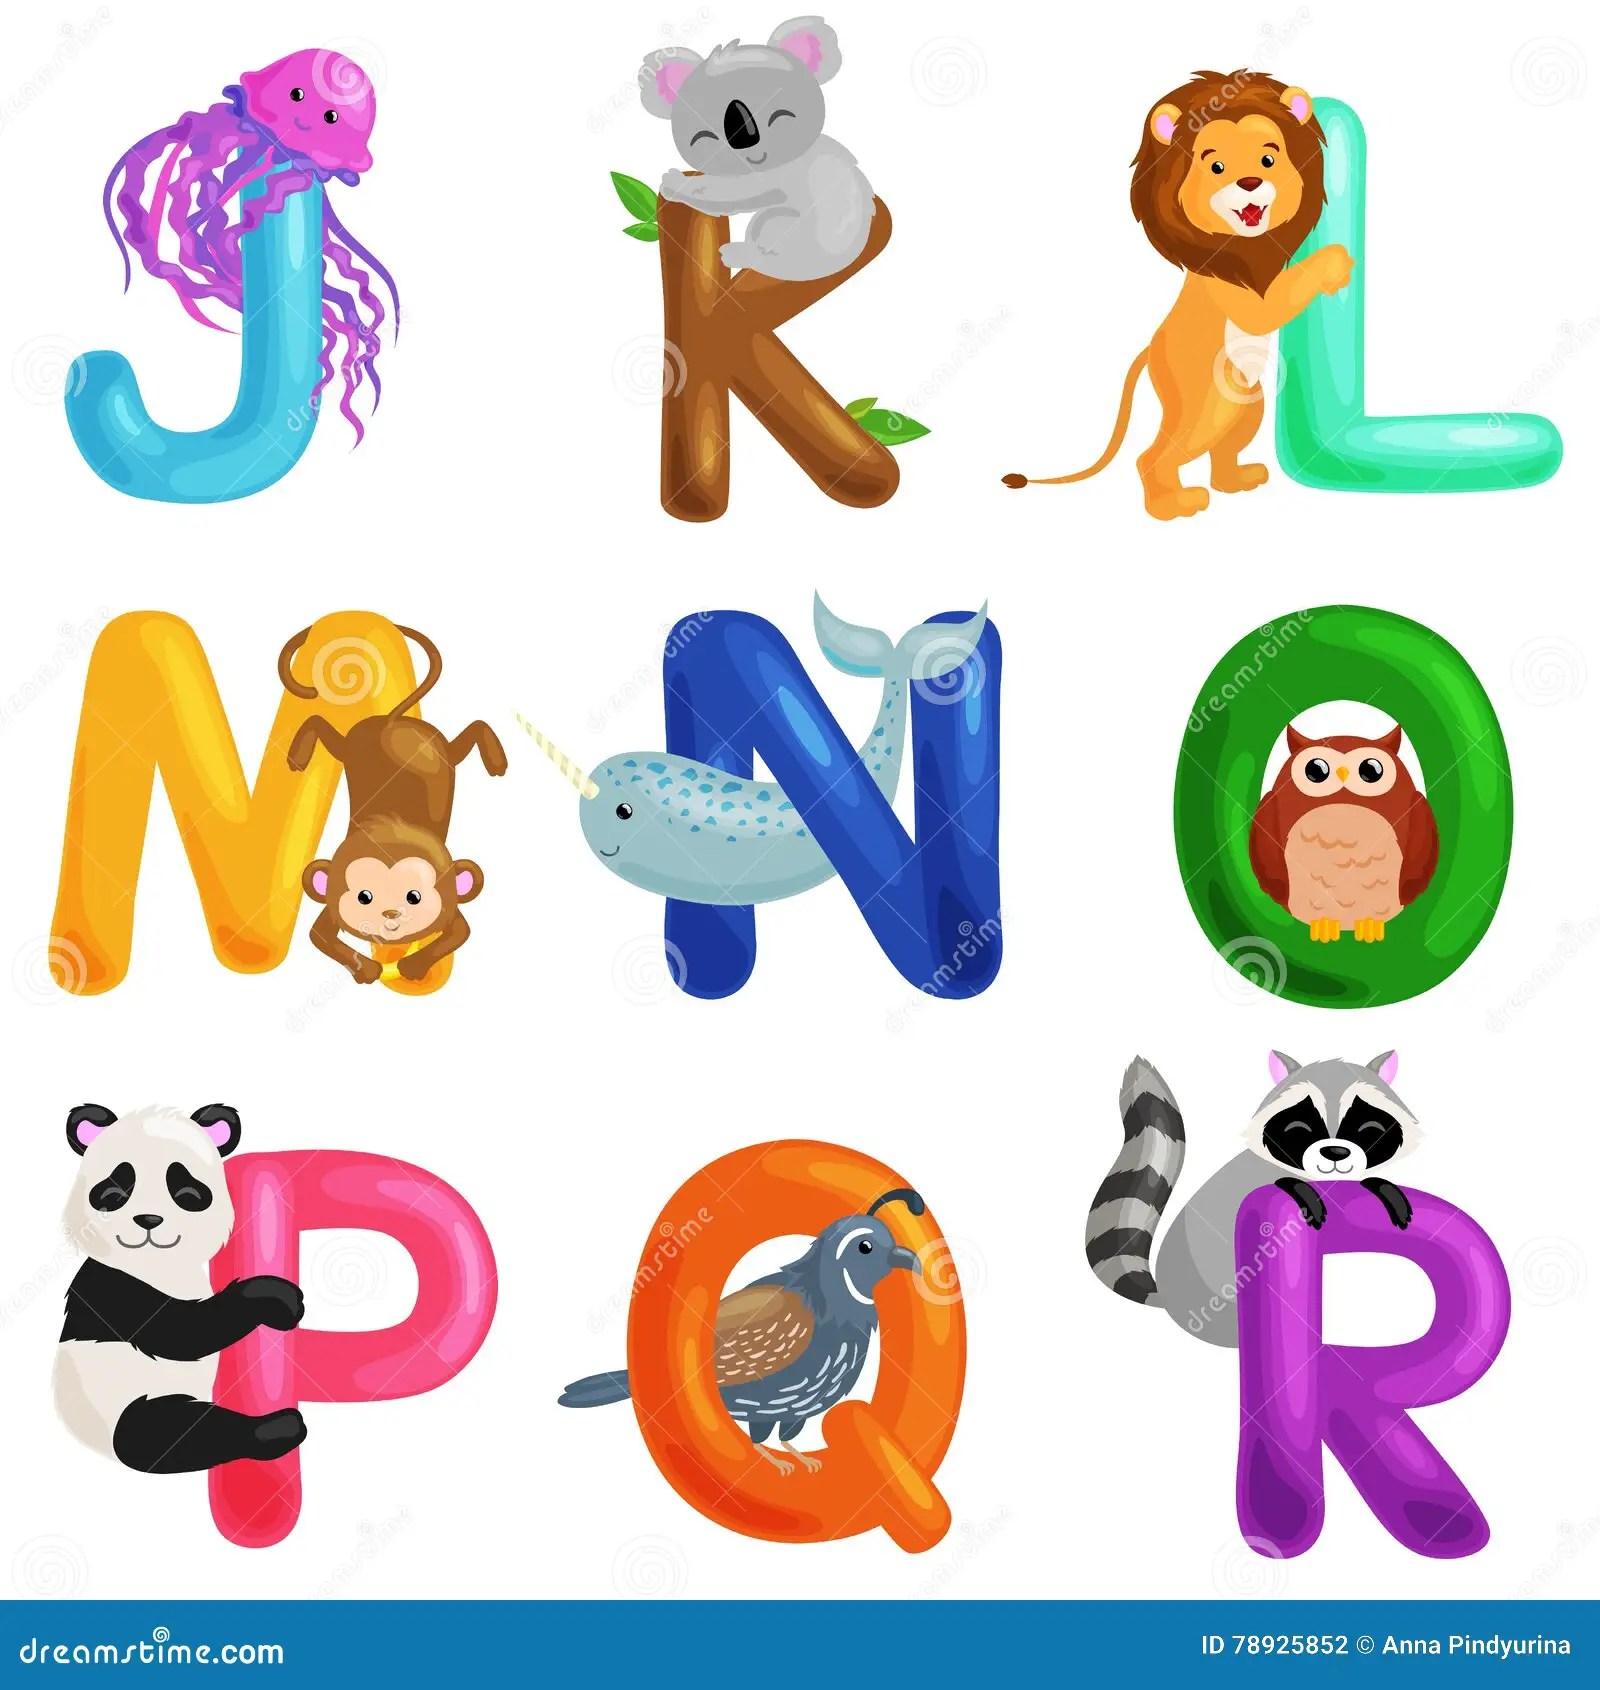 Animals Alphabet Set For Kids Abc Education In Preschool